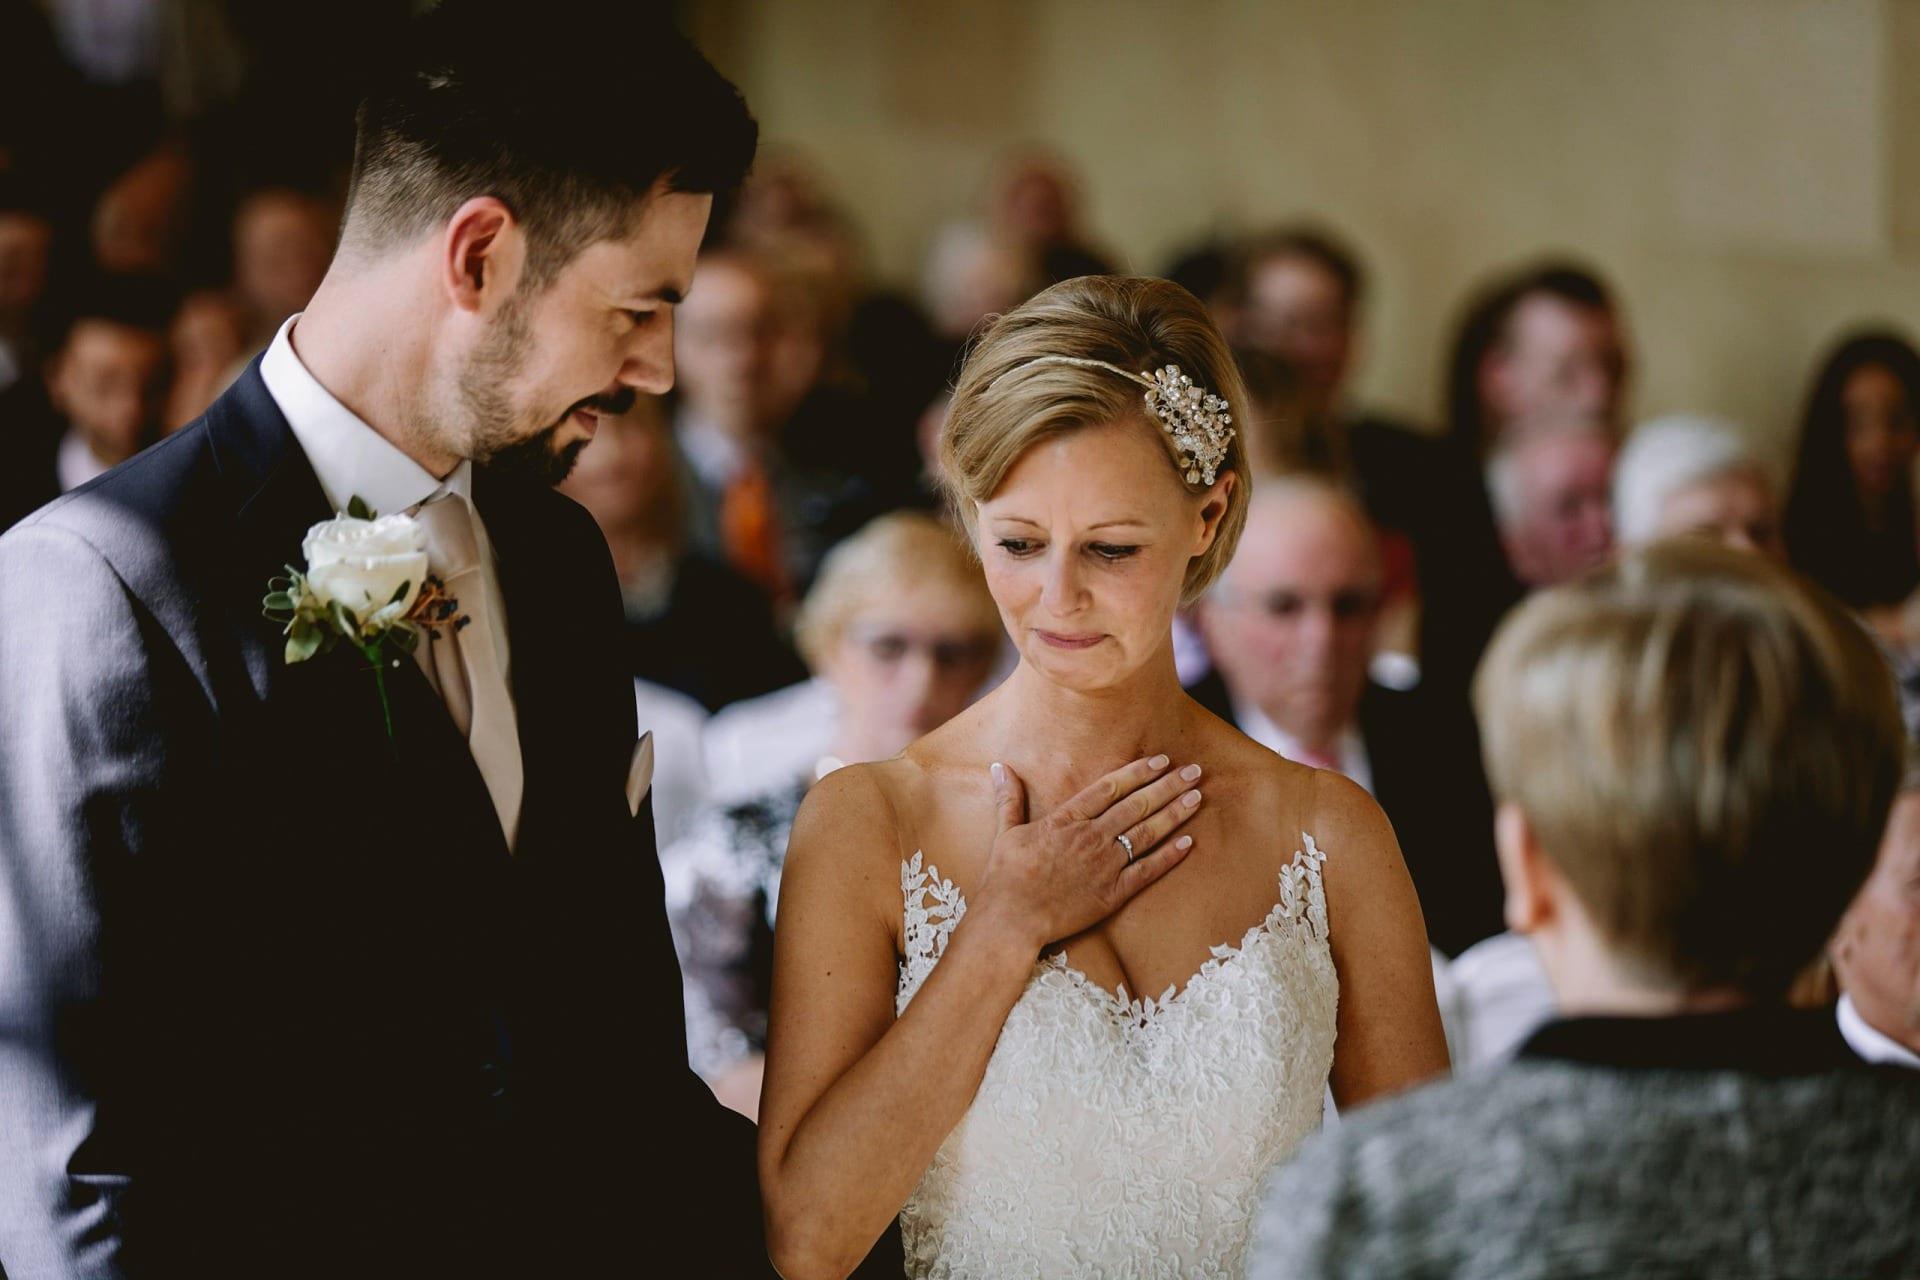 Bride gets emotional during her wedding vows